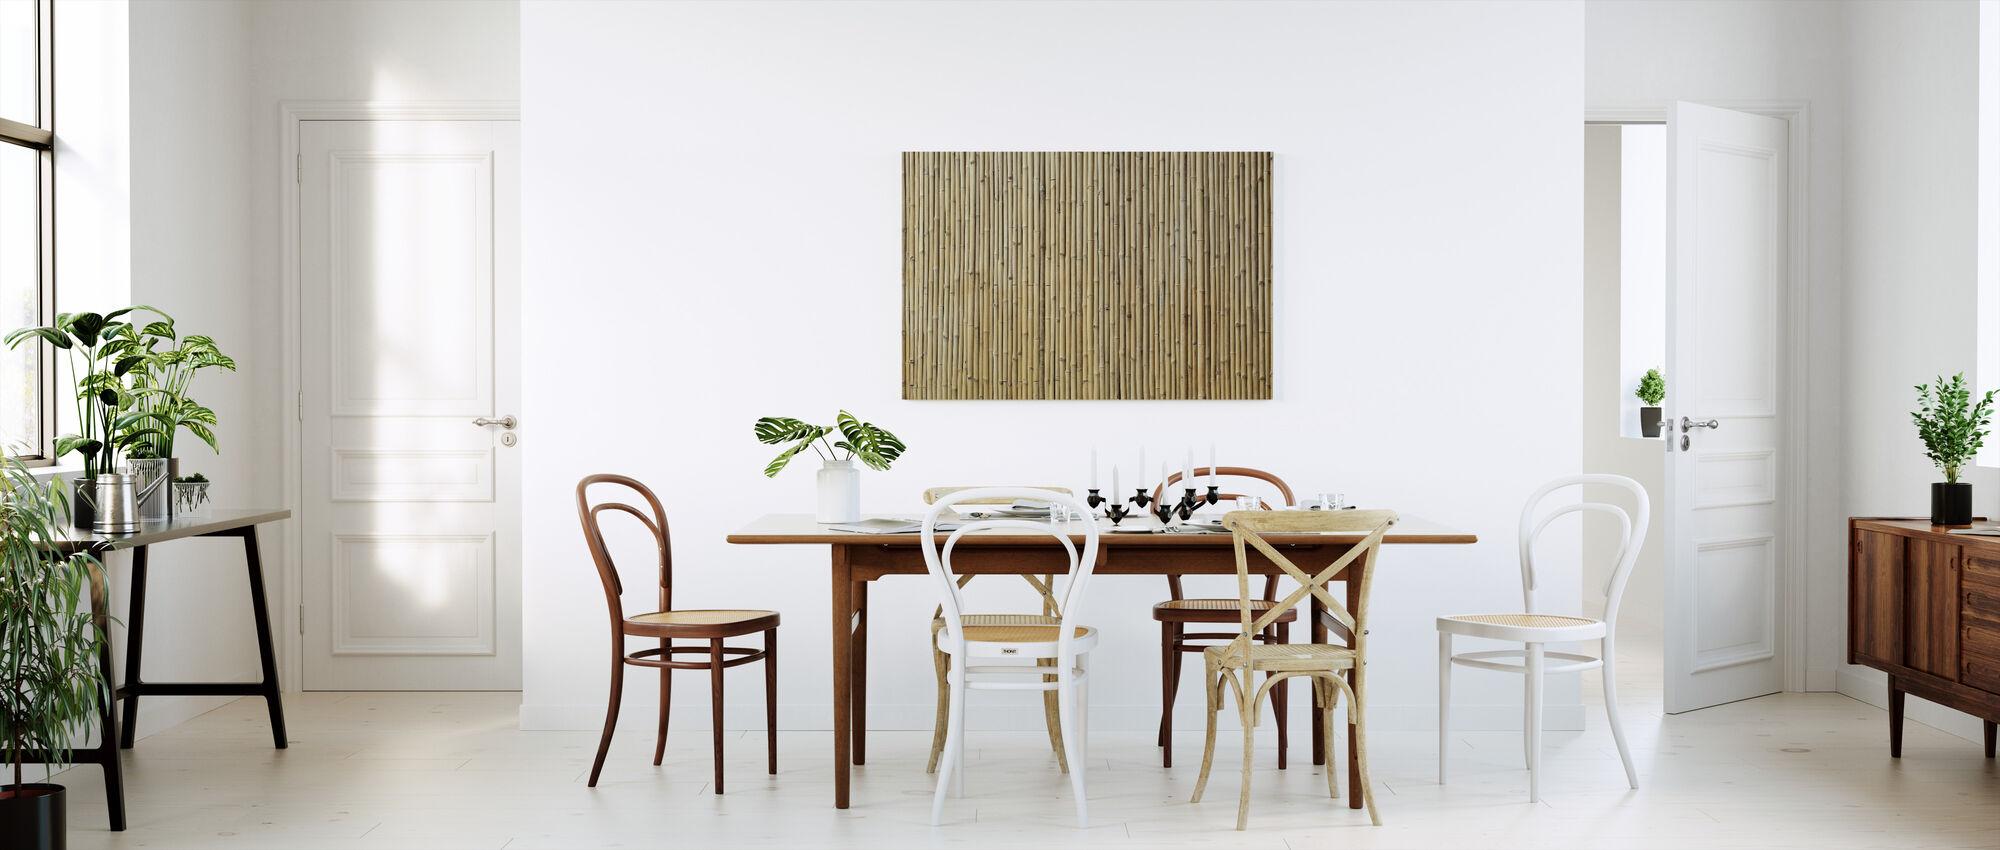 Bamboo Texture - Canvas print - Kitchen